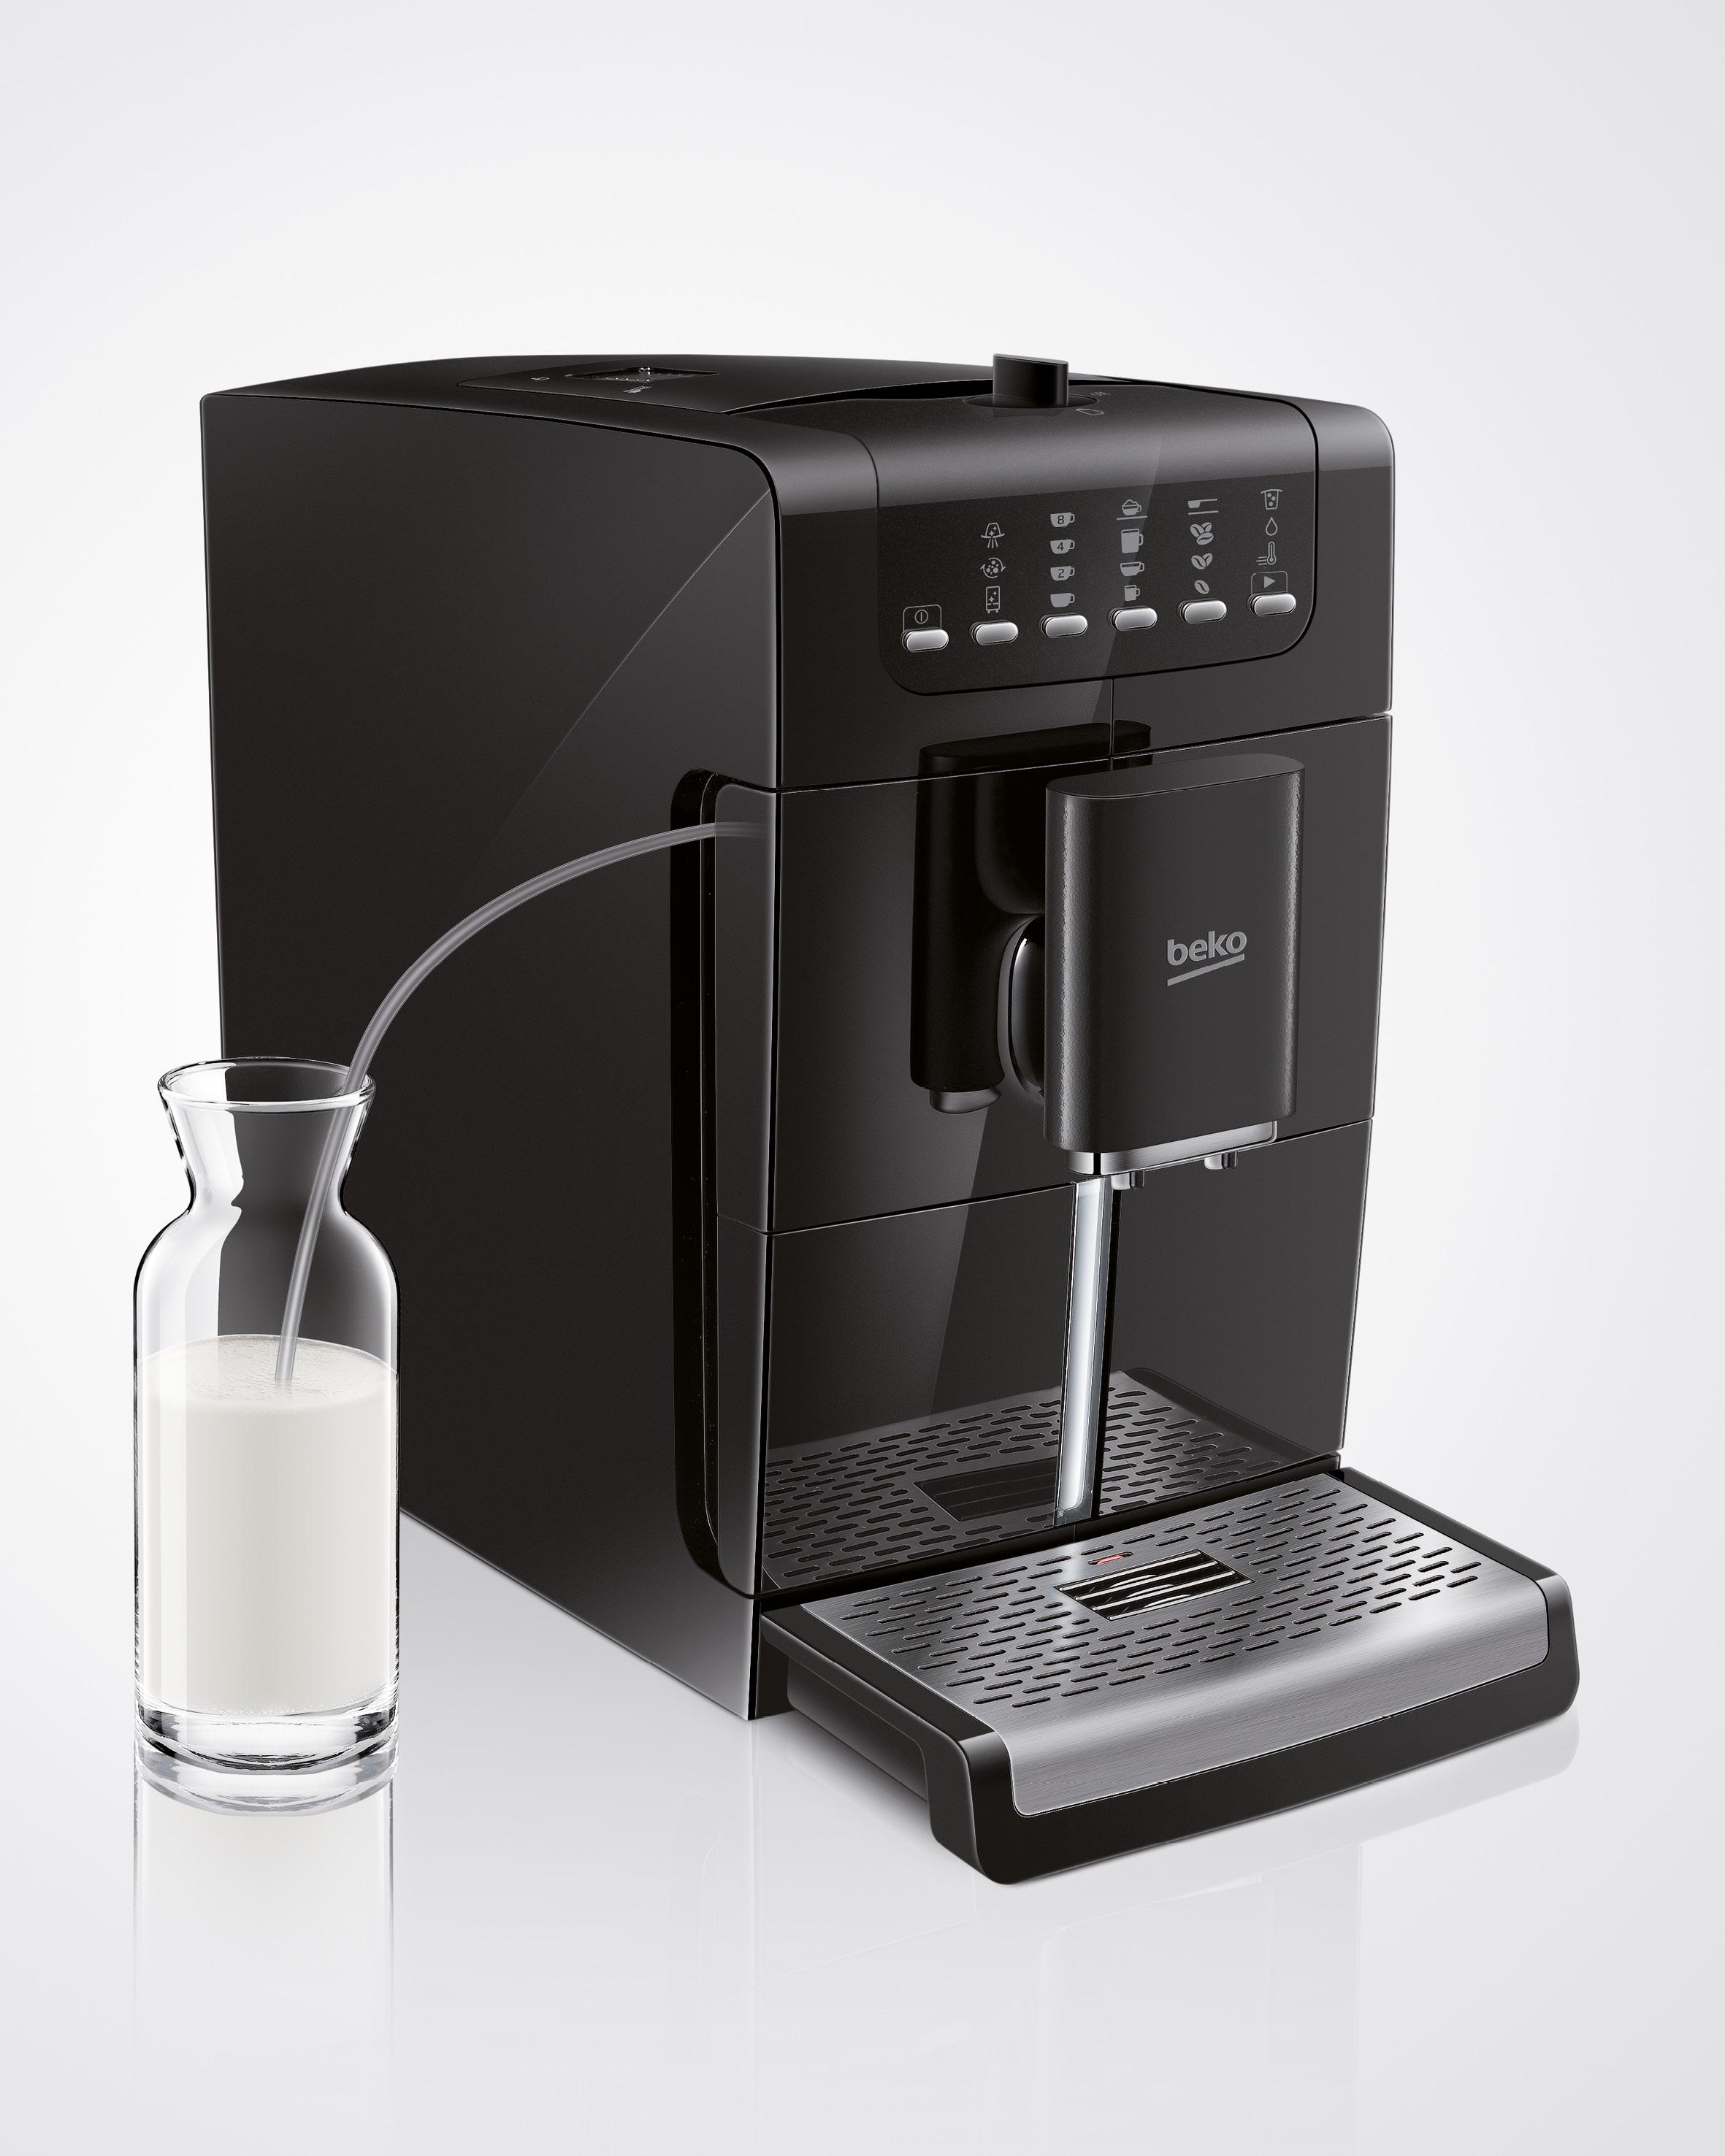 machine caf avec broyeur intgr beautiful machine a cafe saeco avec broyeur blog de conception. Black Bedroom Furniture Sets. Home Design Ideas